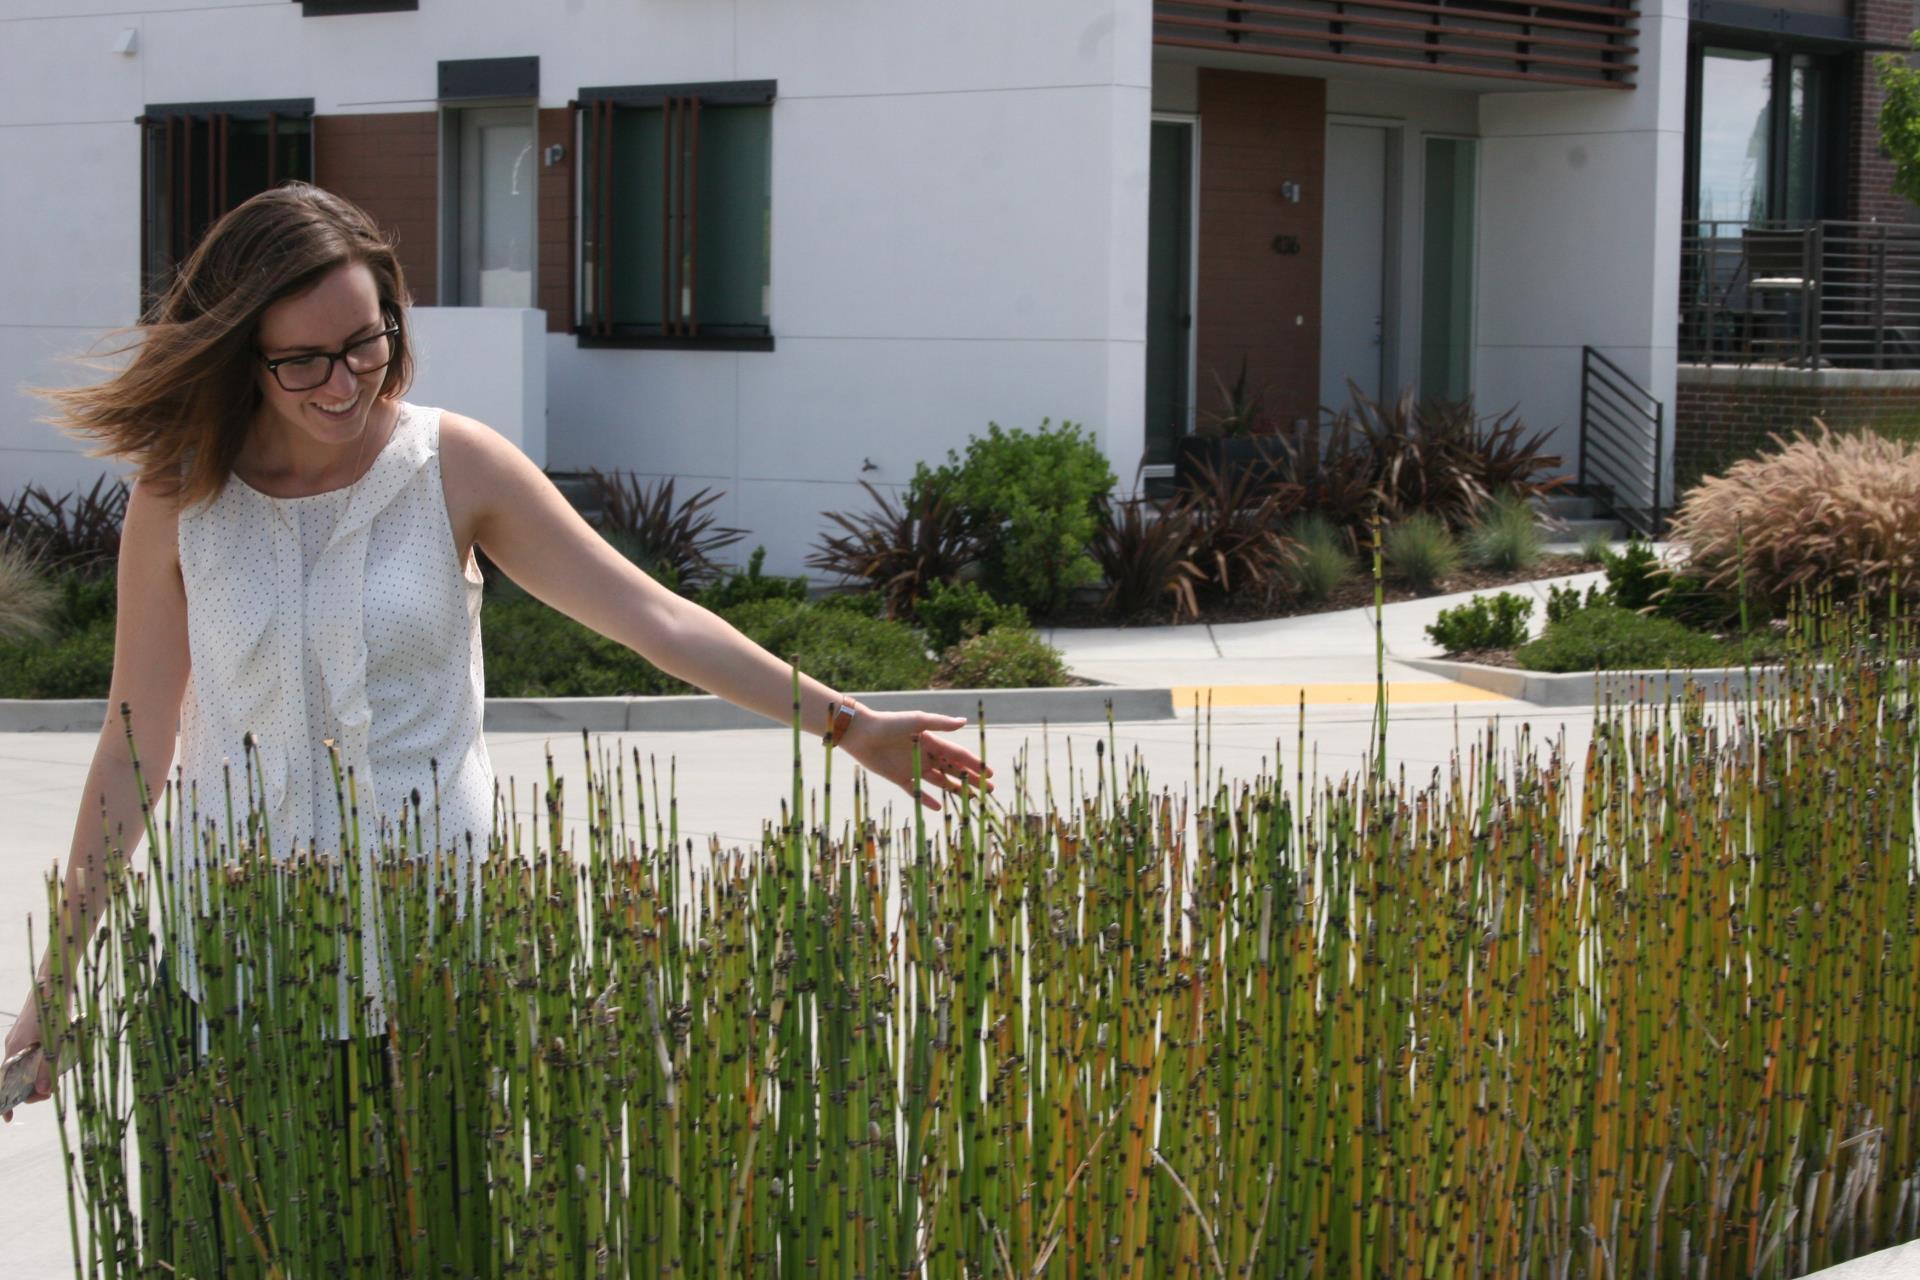 Economic Development & Housing | City of West Sacramento